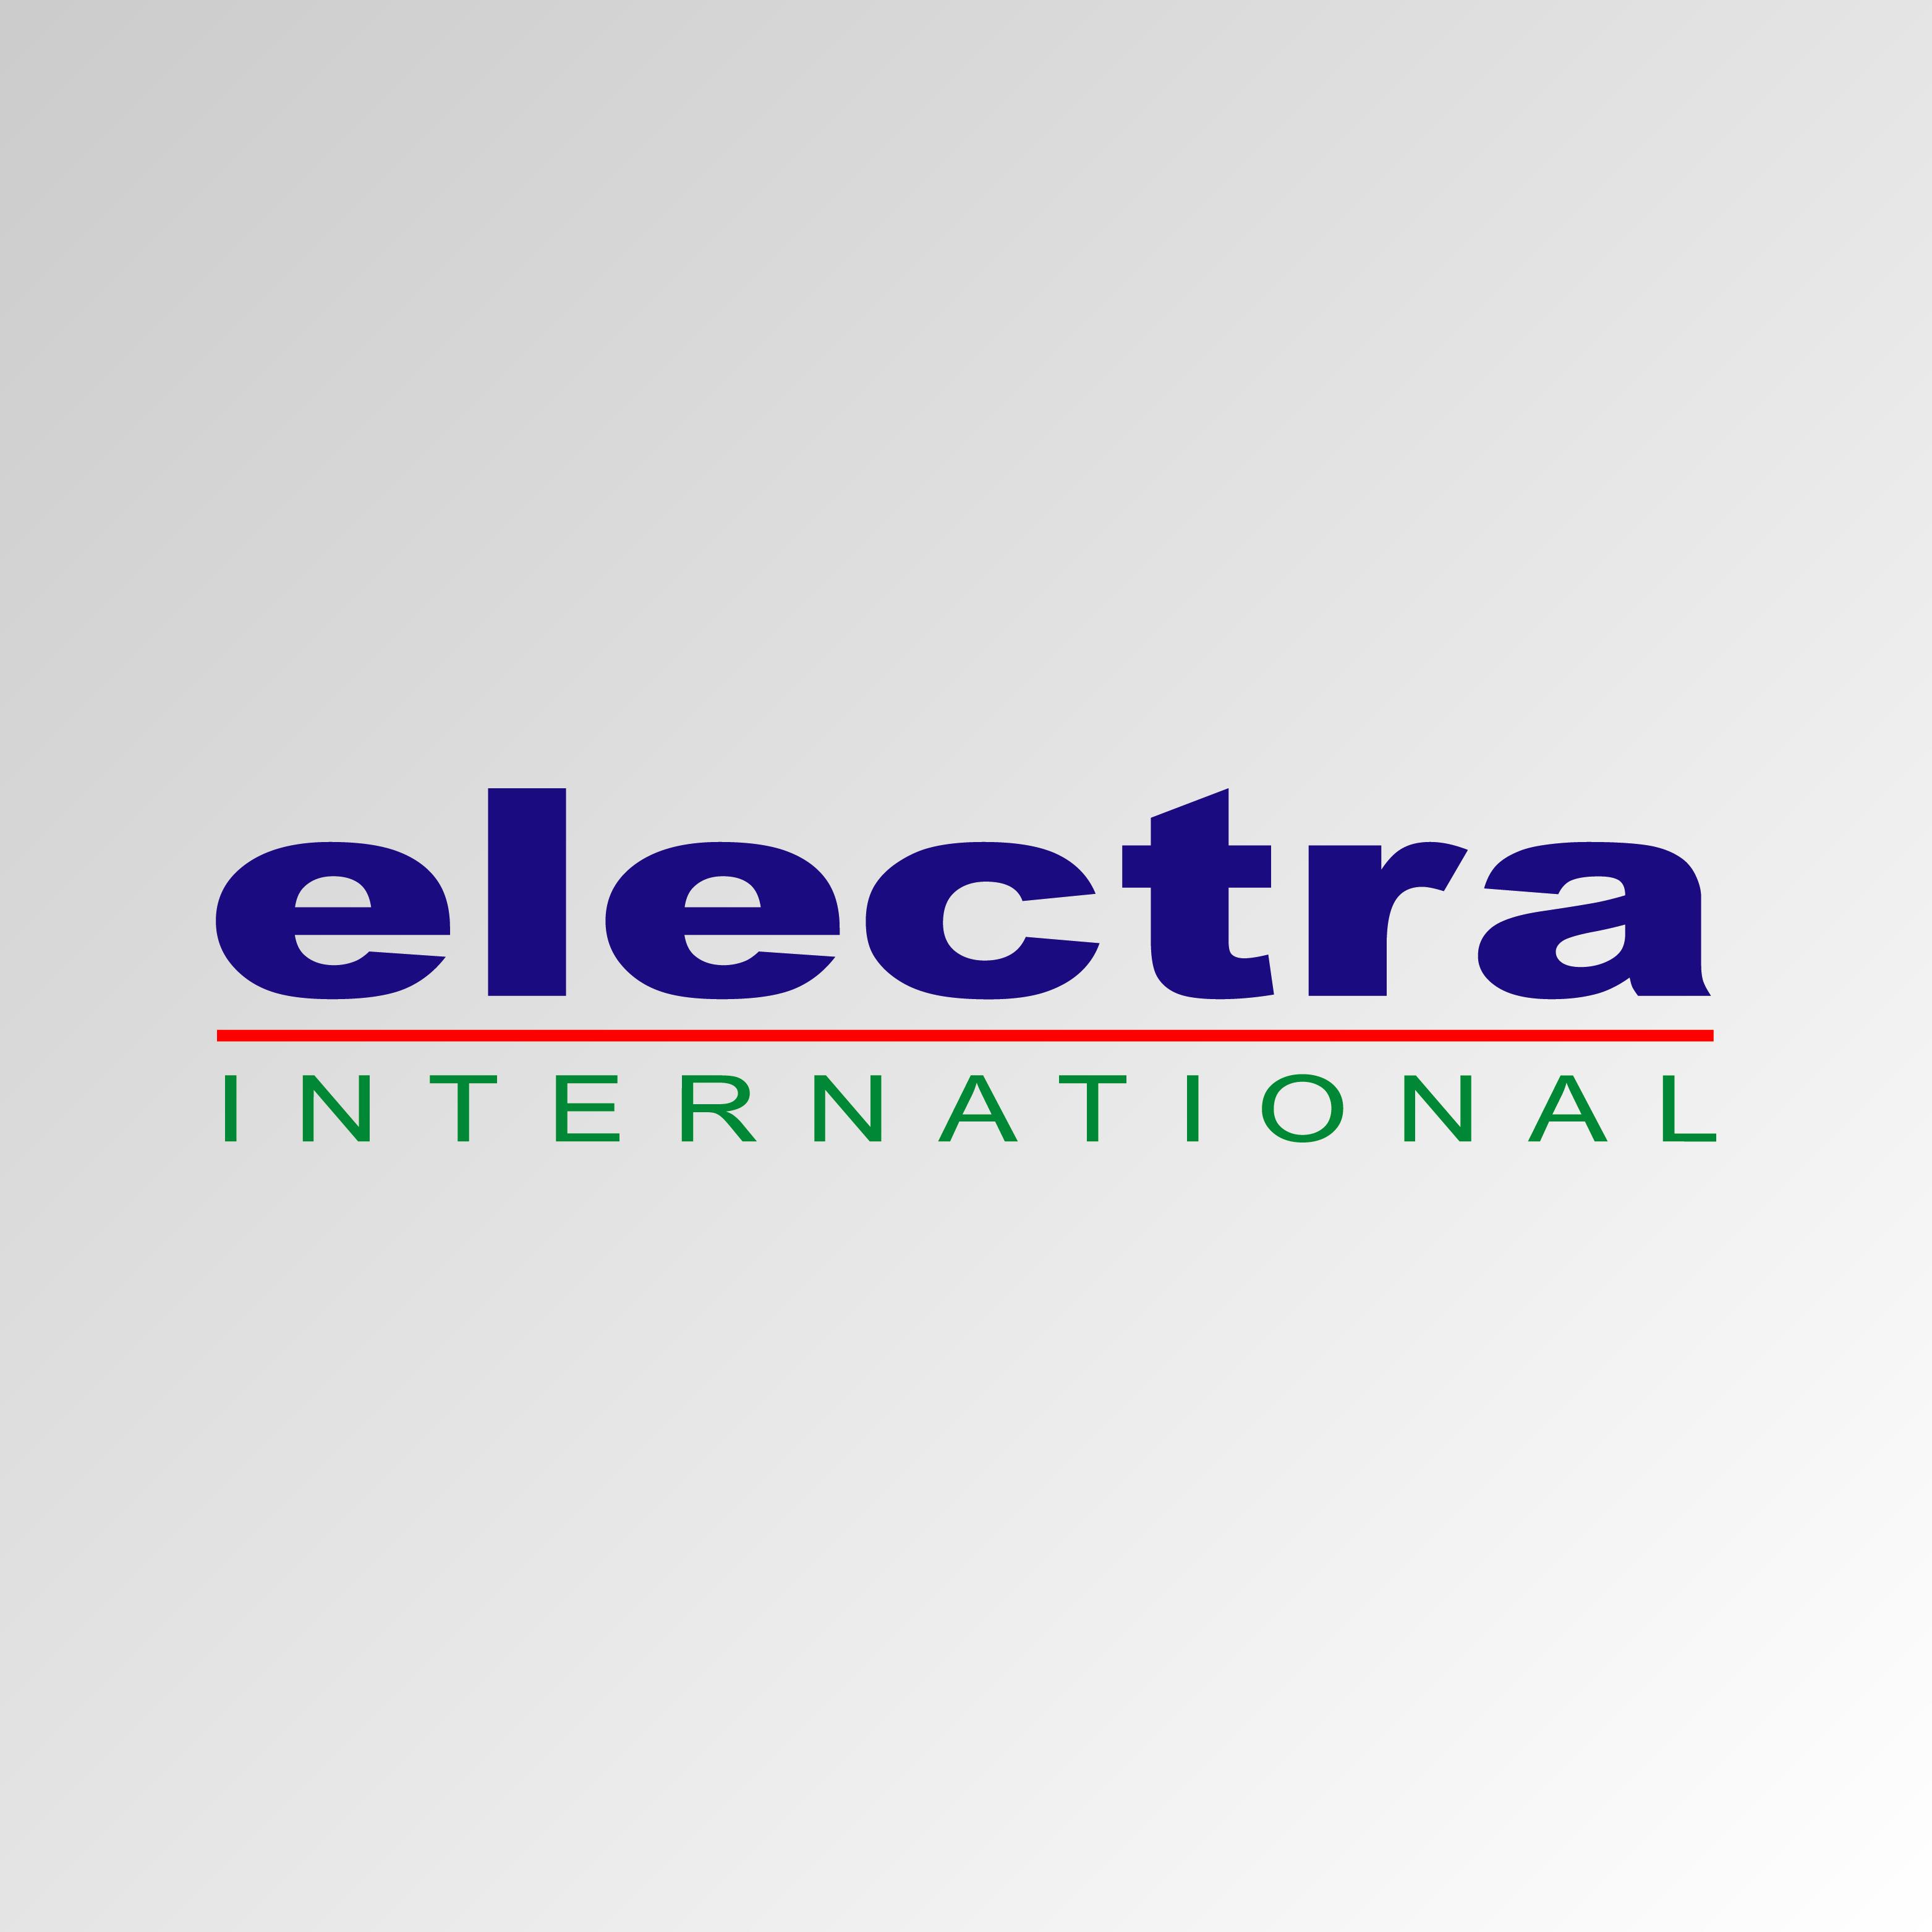 Electra International.